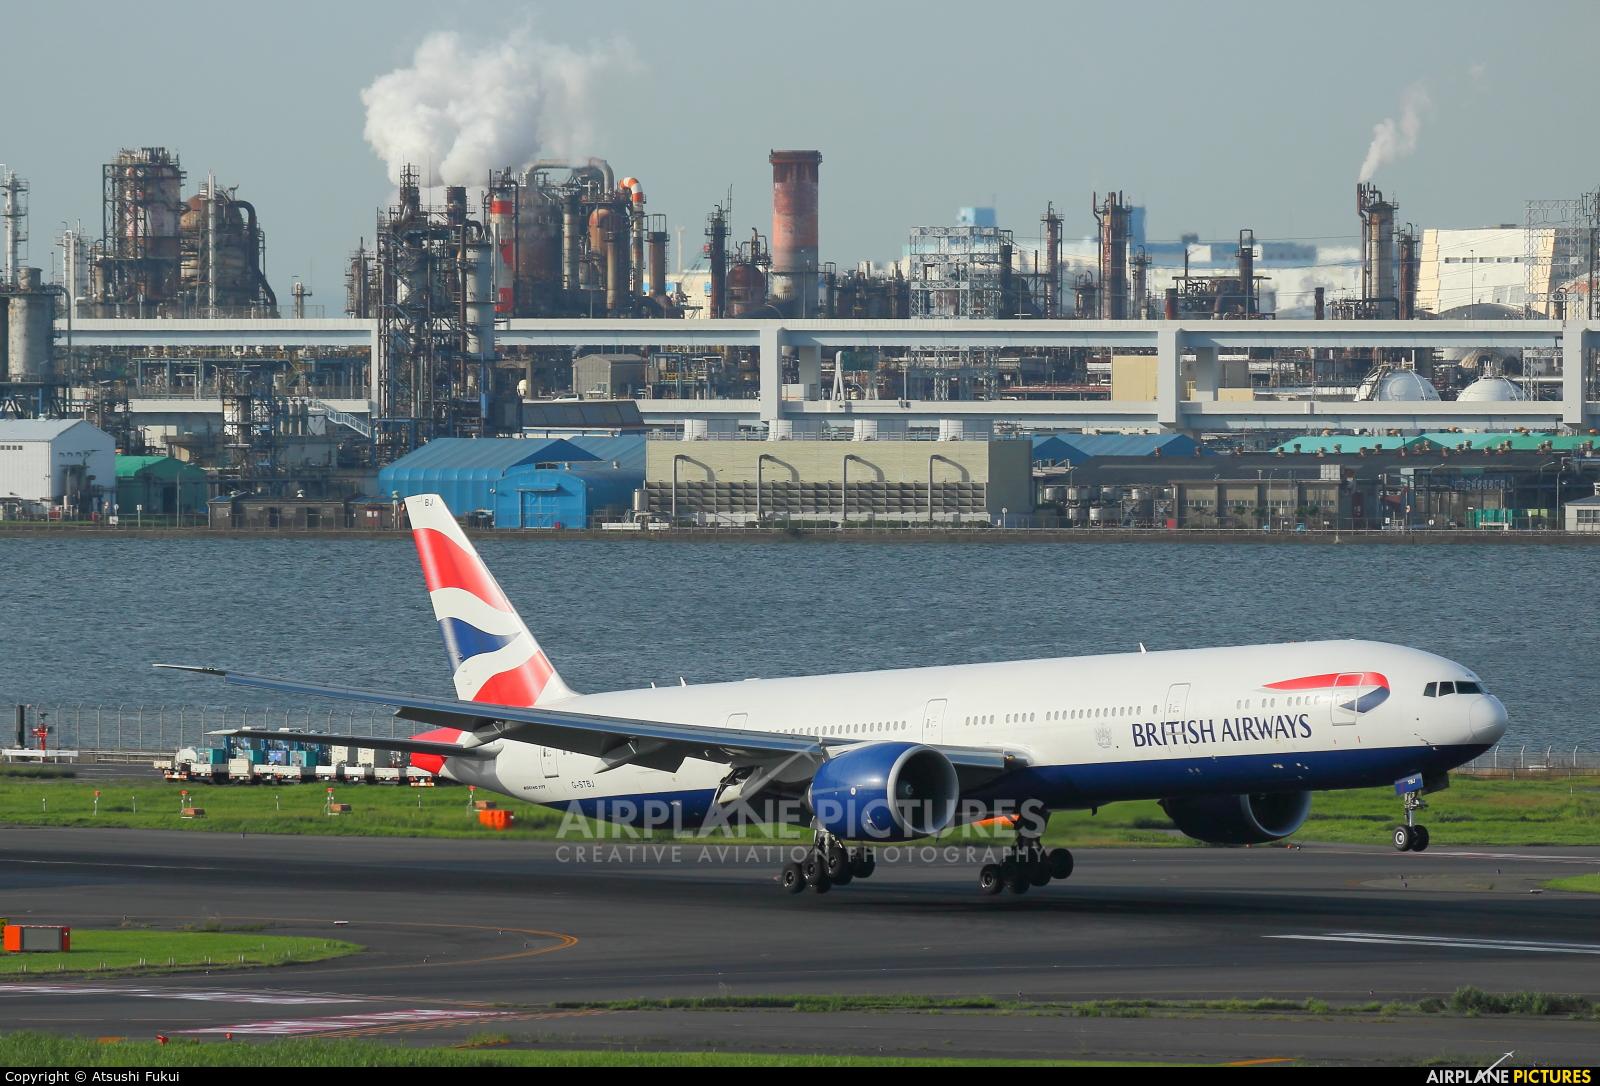 British Airways G-STBJ aircraft at Tokyo - Haneda Intl